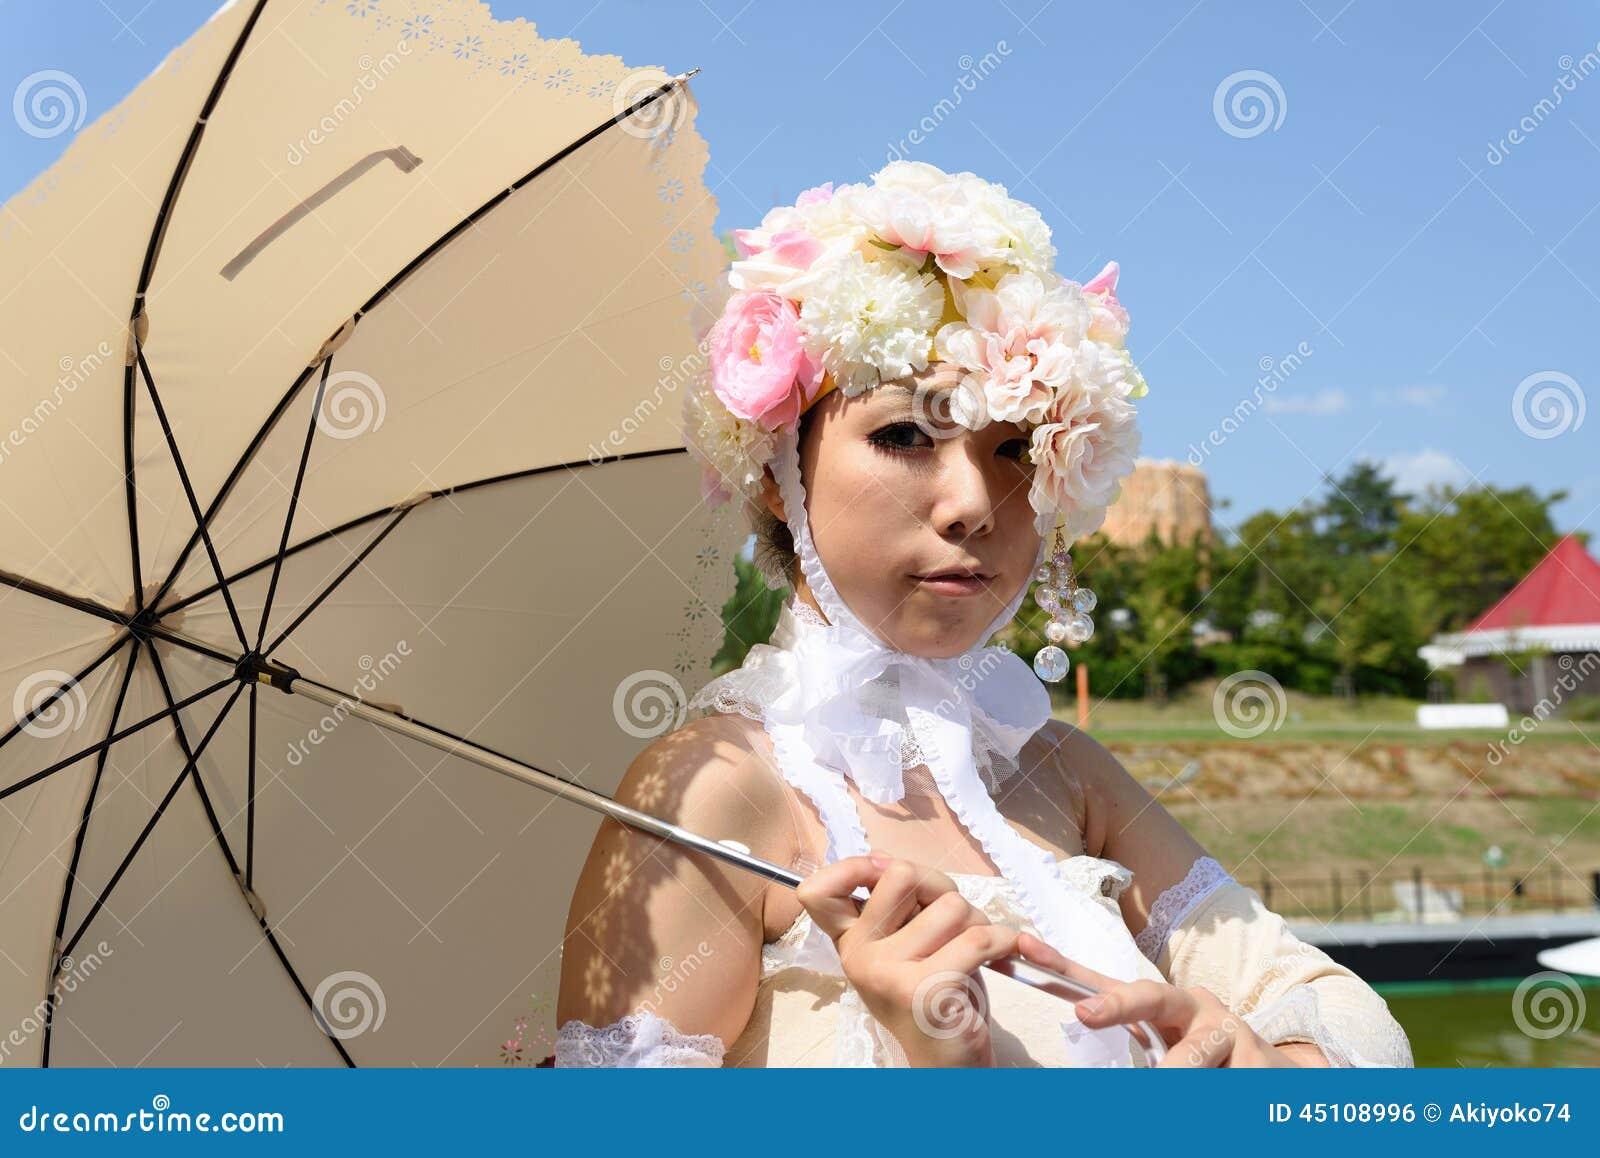 cosplay女孩日语 编辑类照片